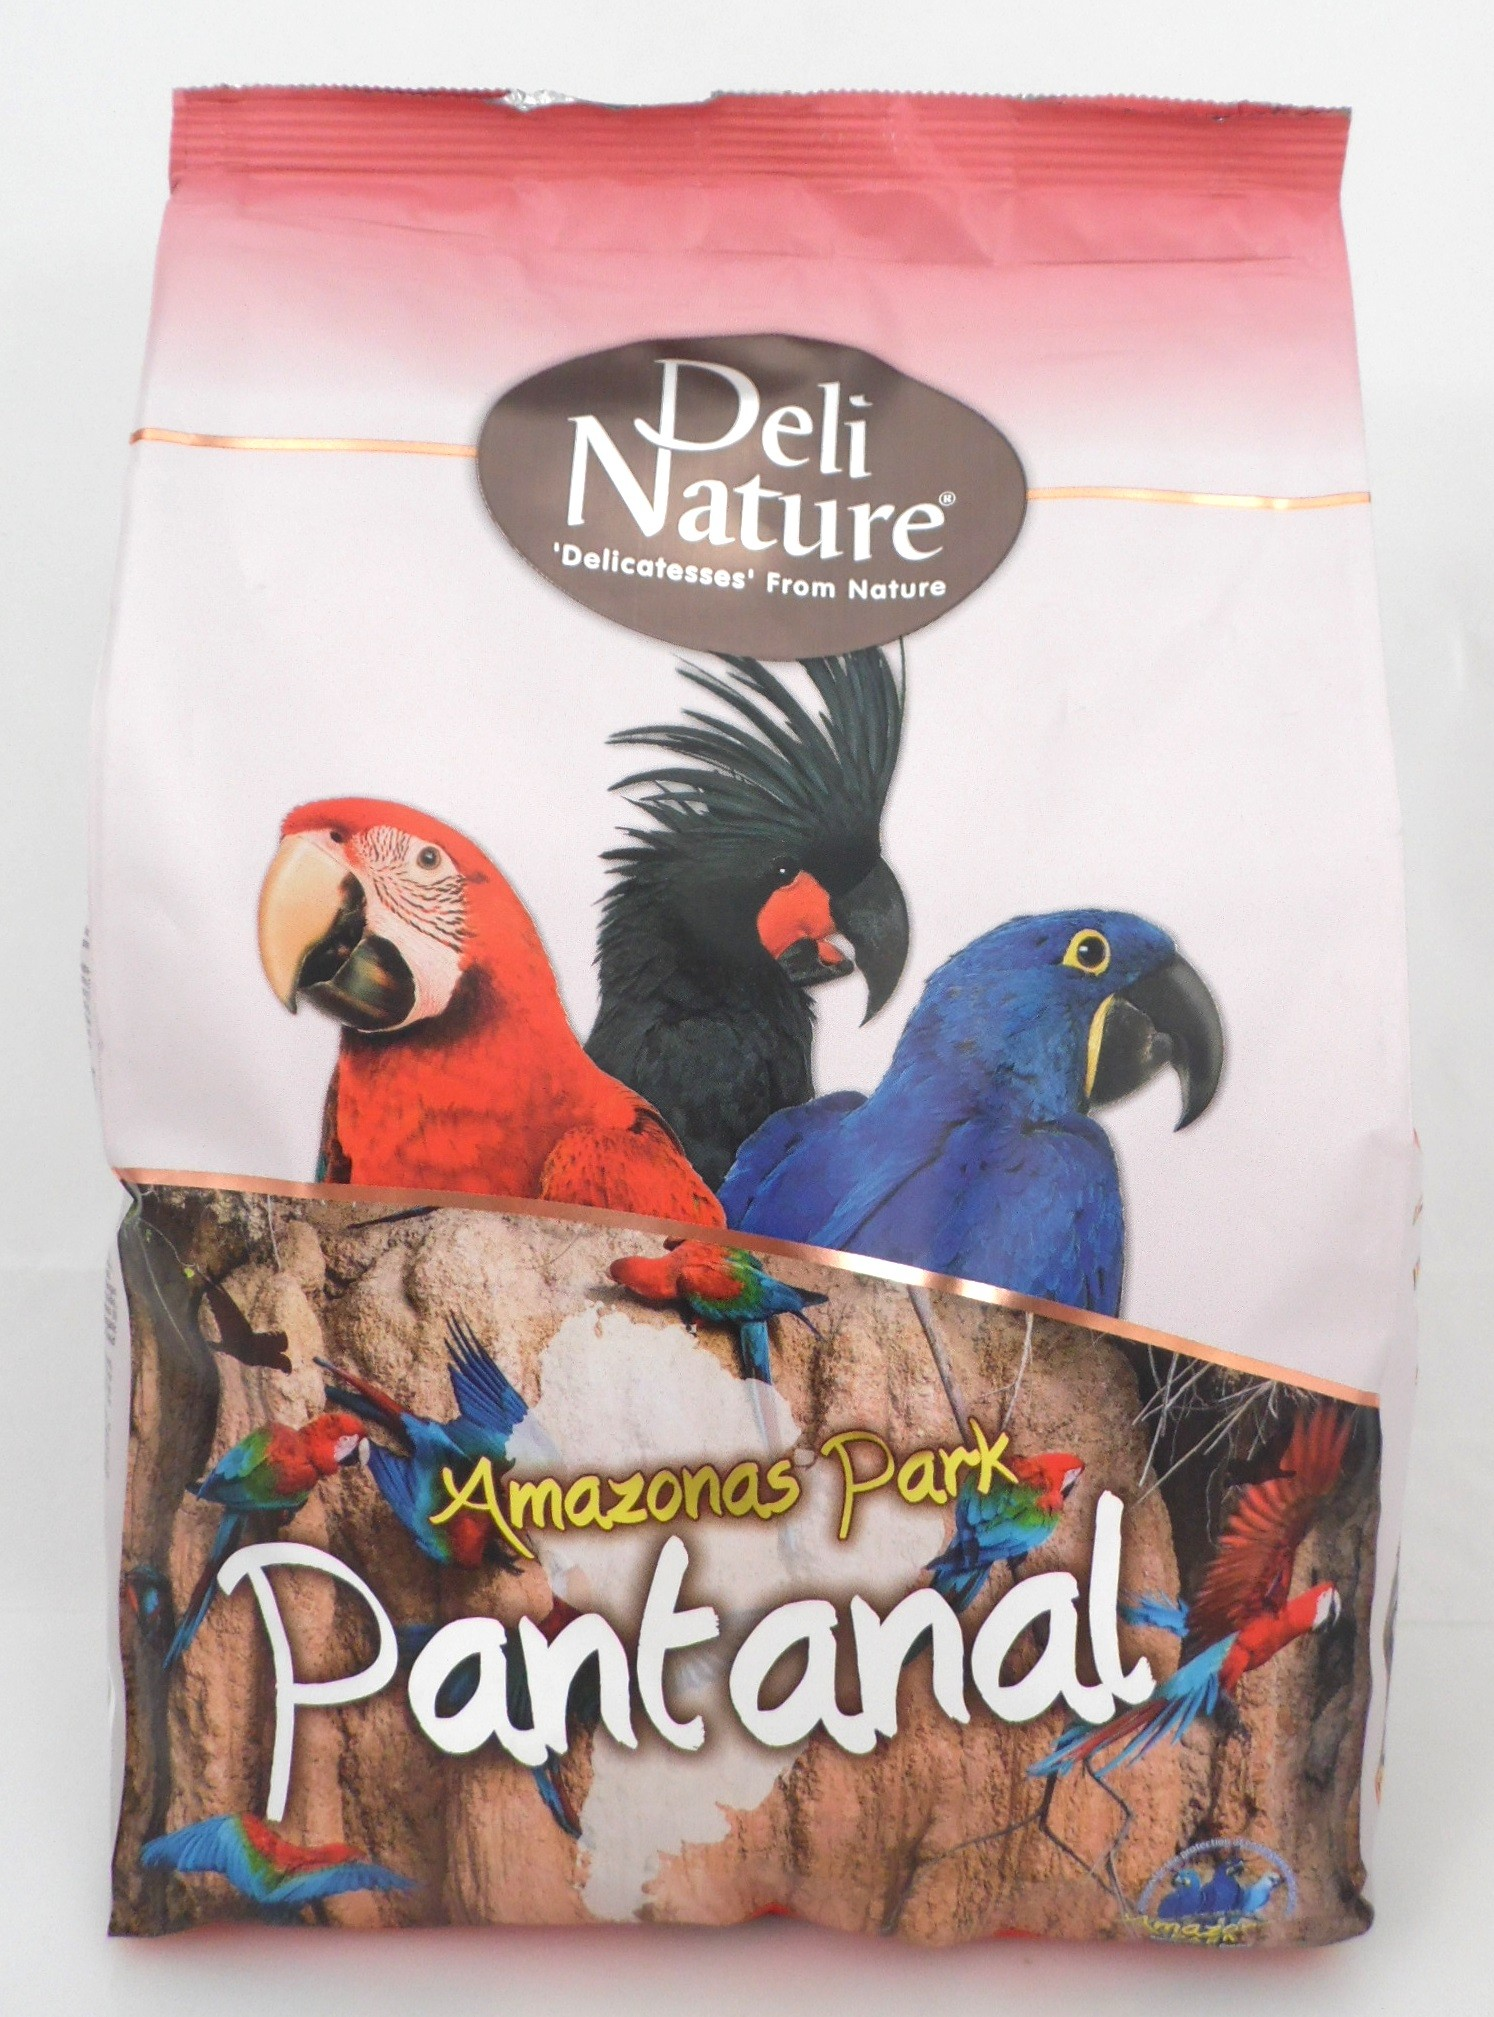 Deli Nature AMAZONAS PARK PANTANAL